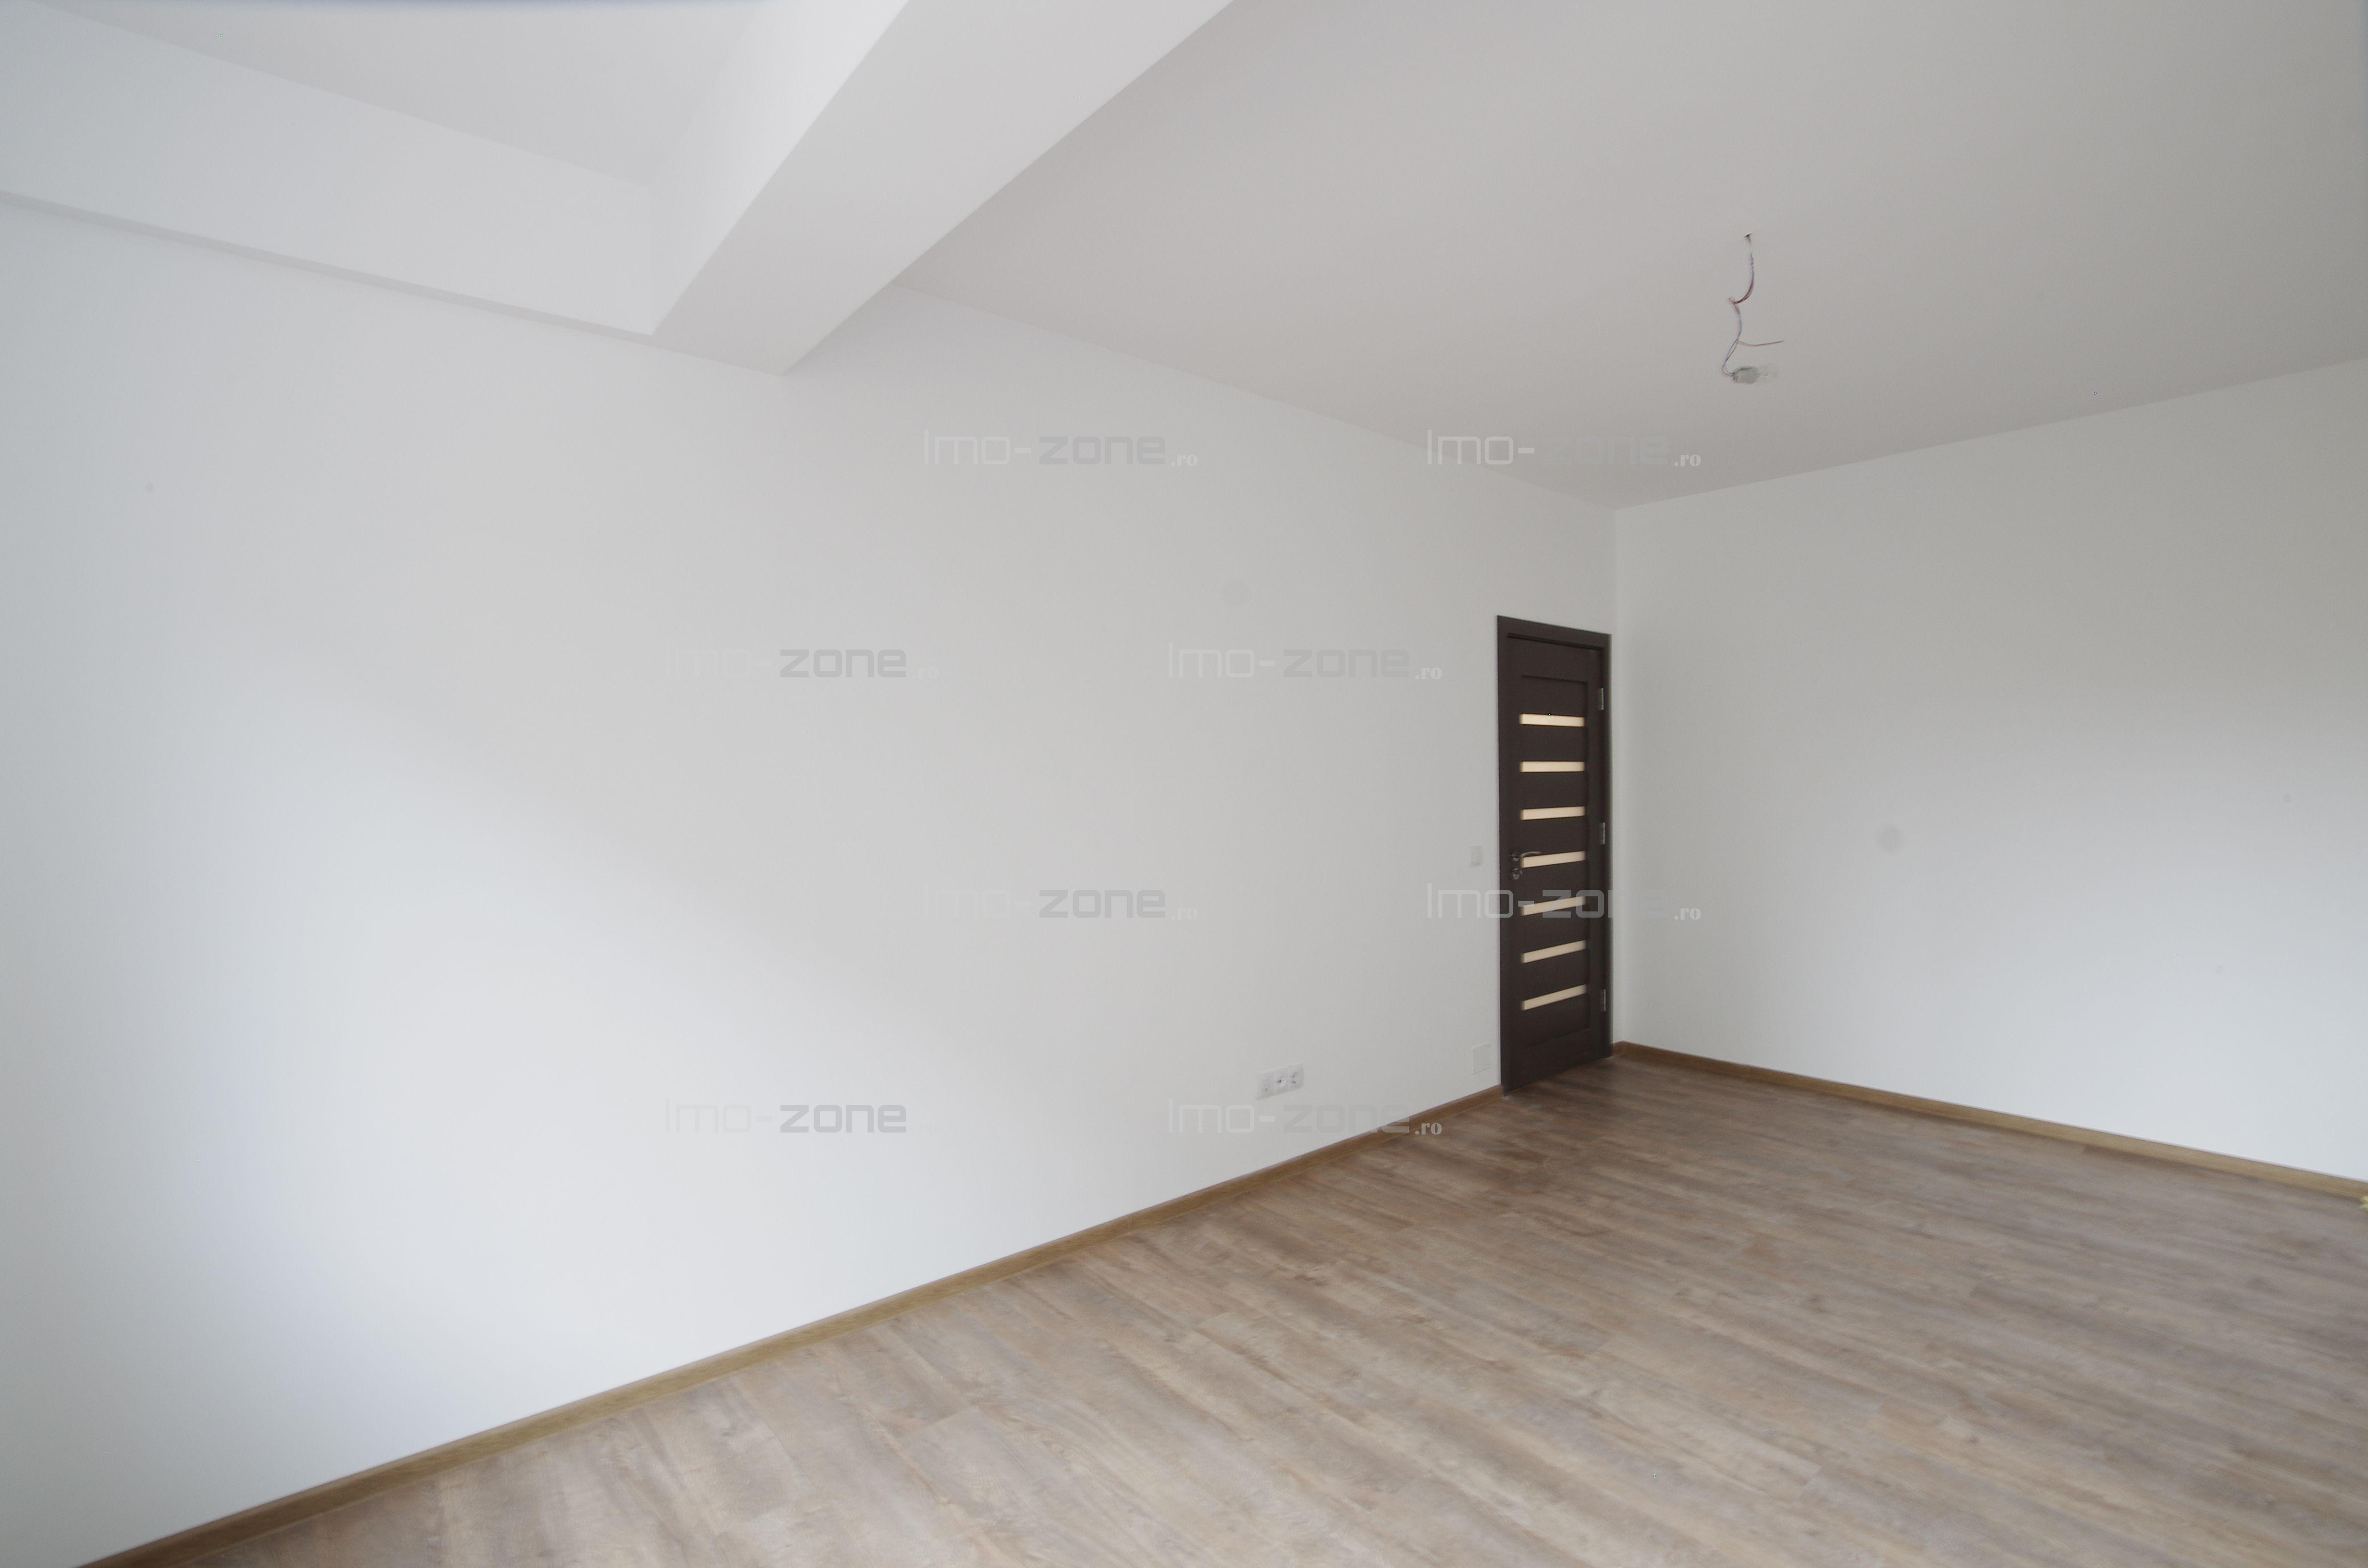 Comision 0%, apartament nou 2018, 2 bai cu geam, decomandat, la cheie.